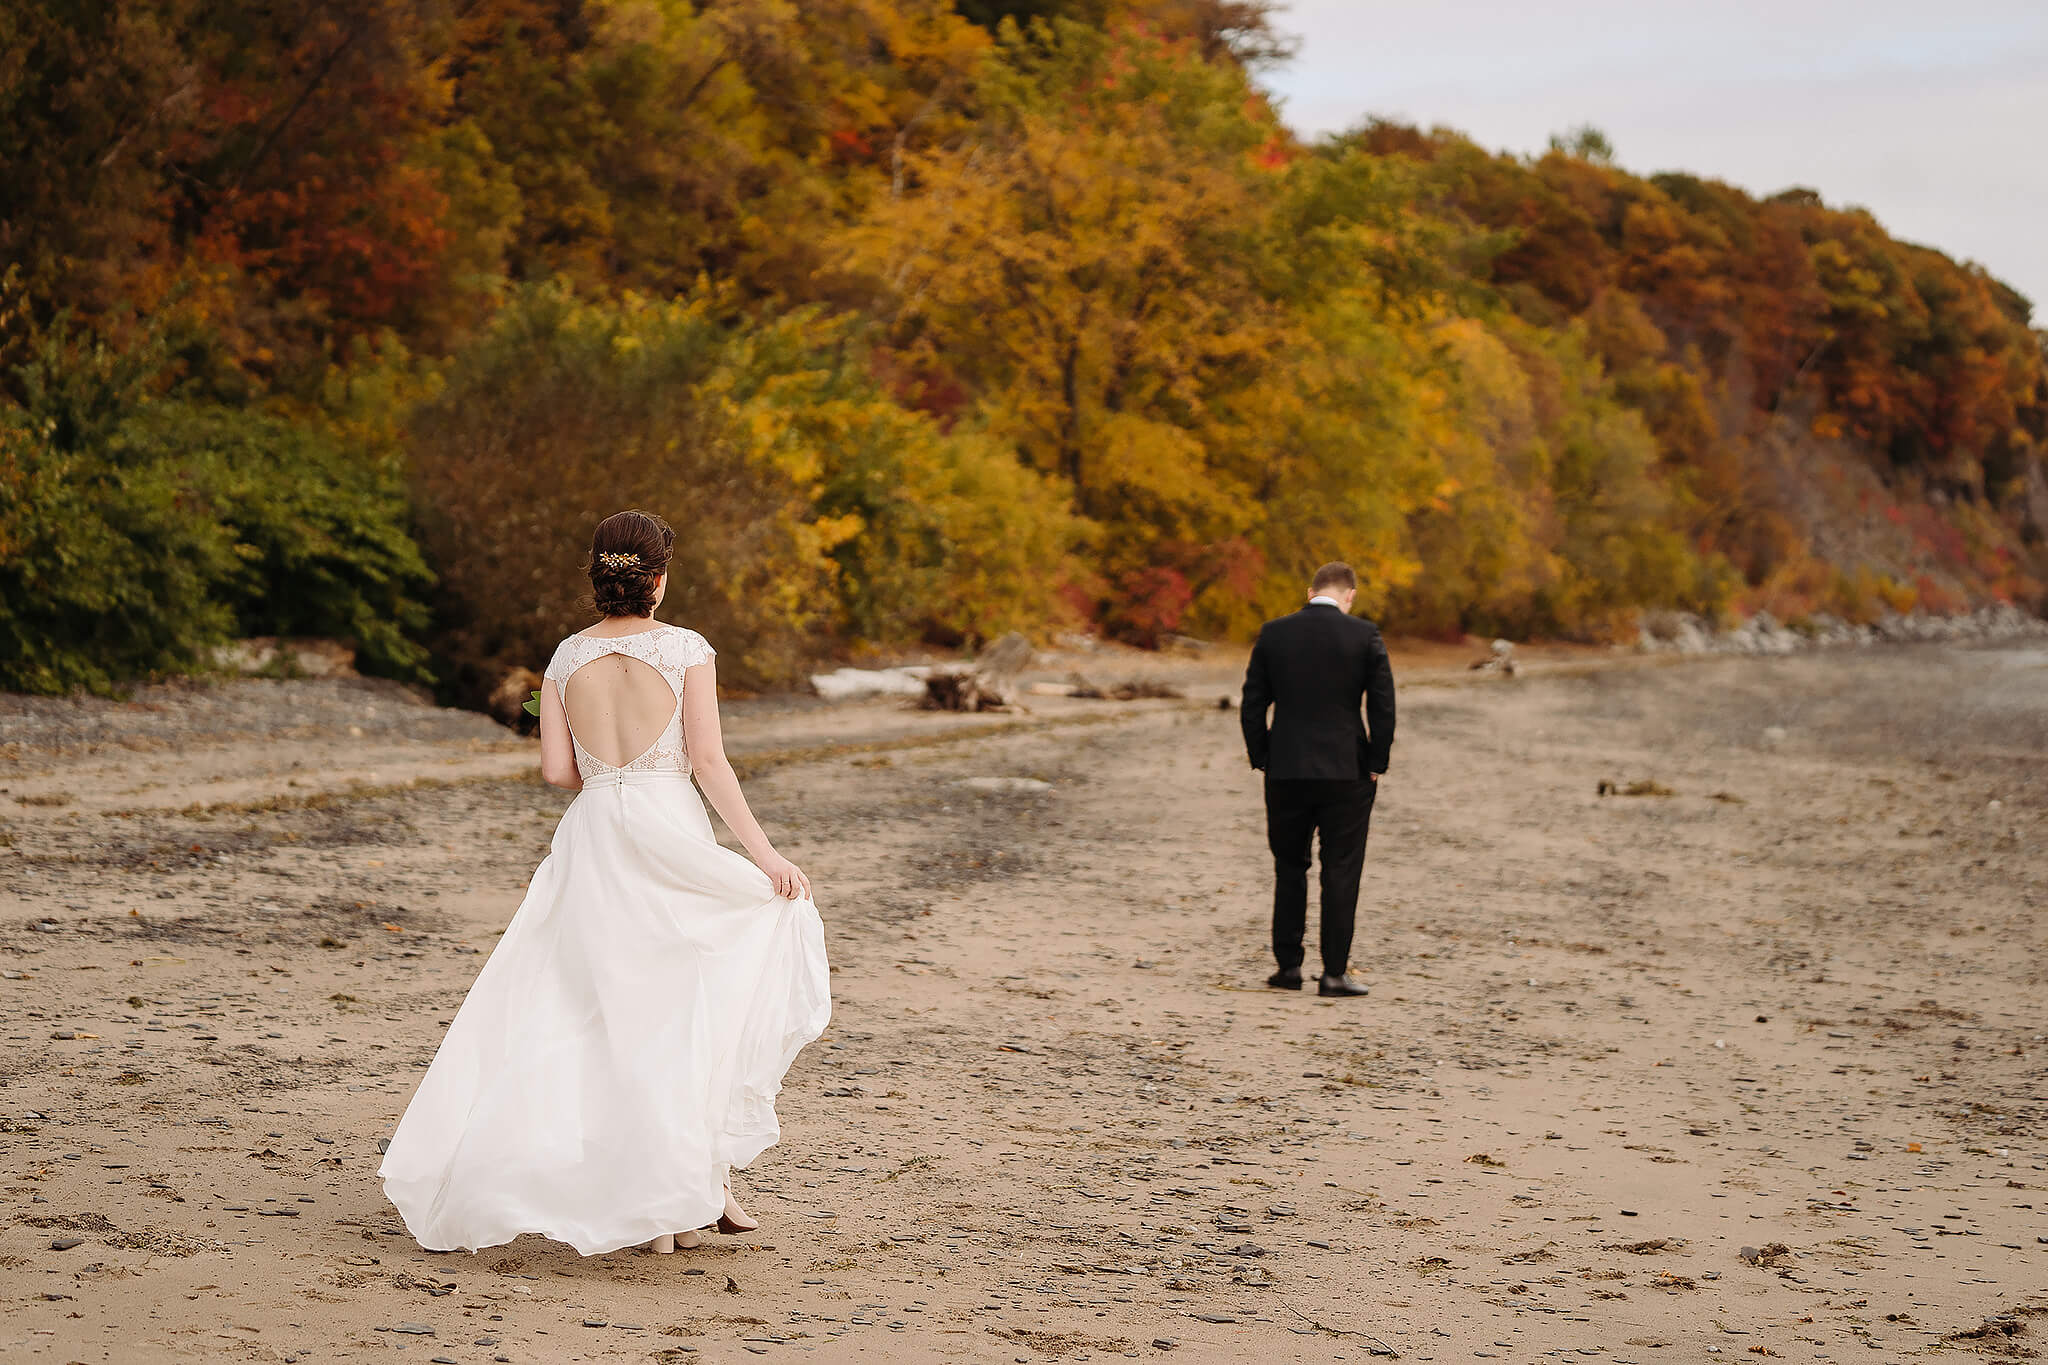 Cap Santé mariage Photographe wedding photographer fall